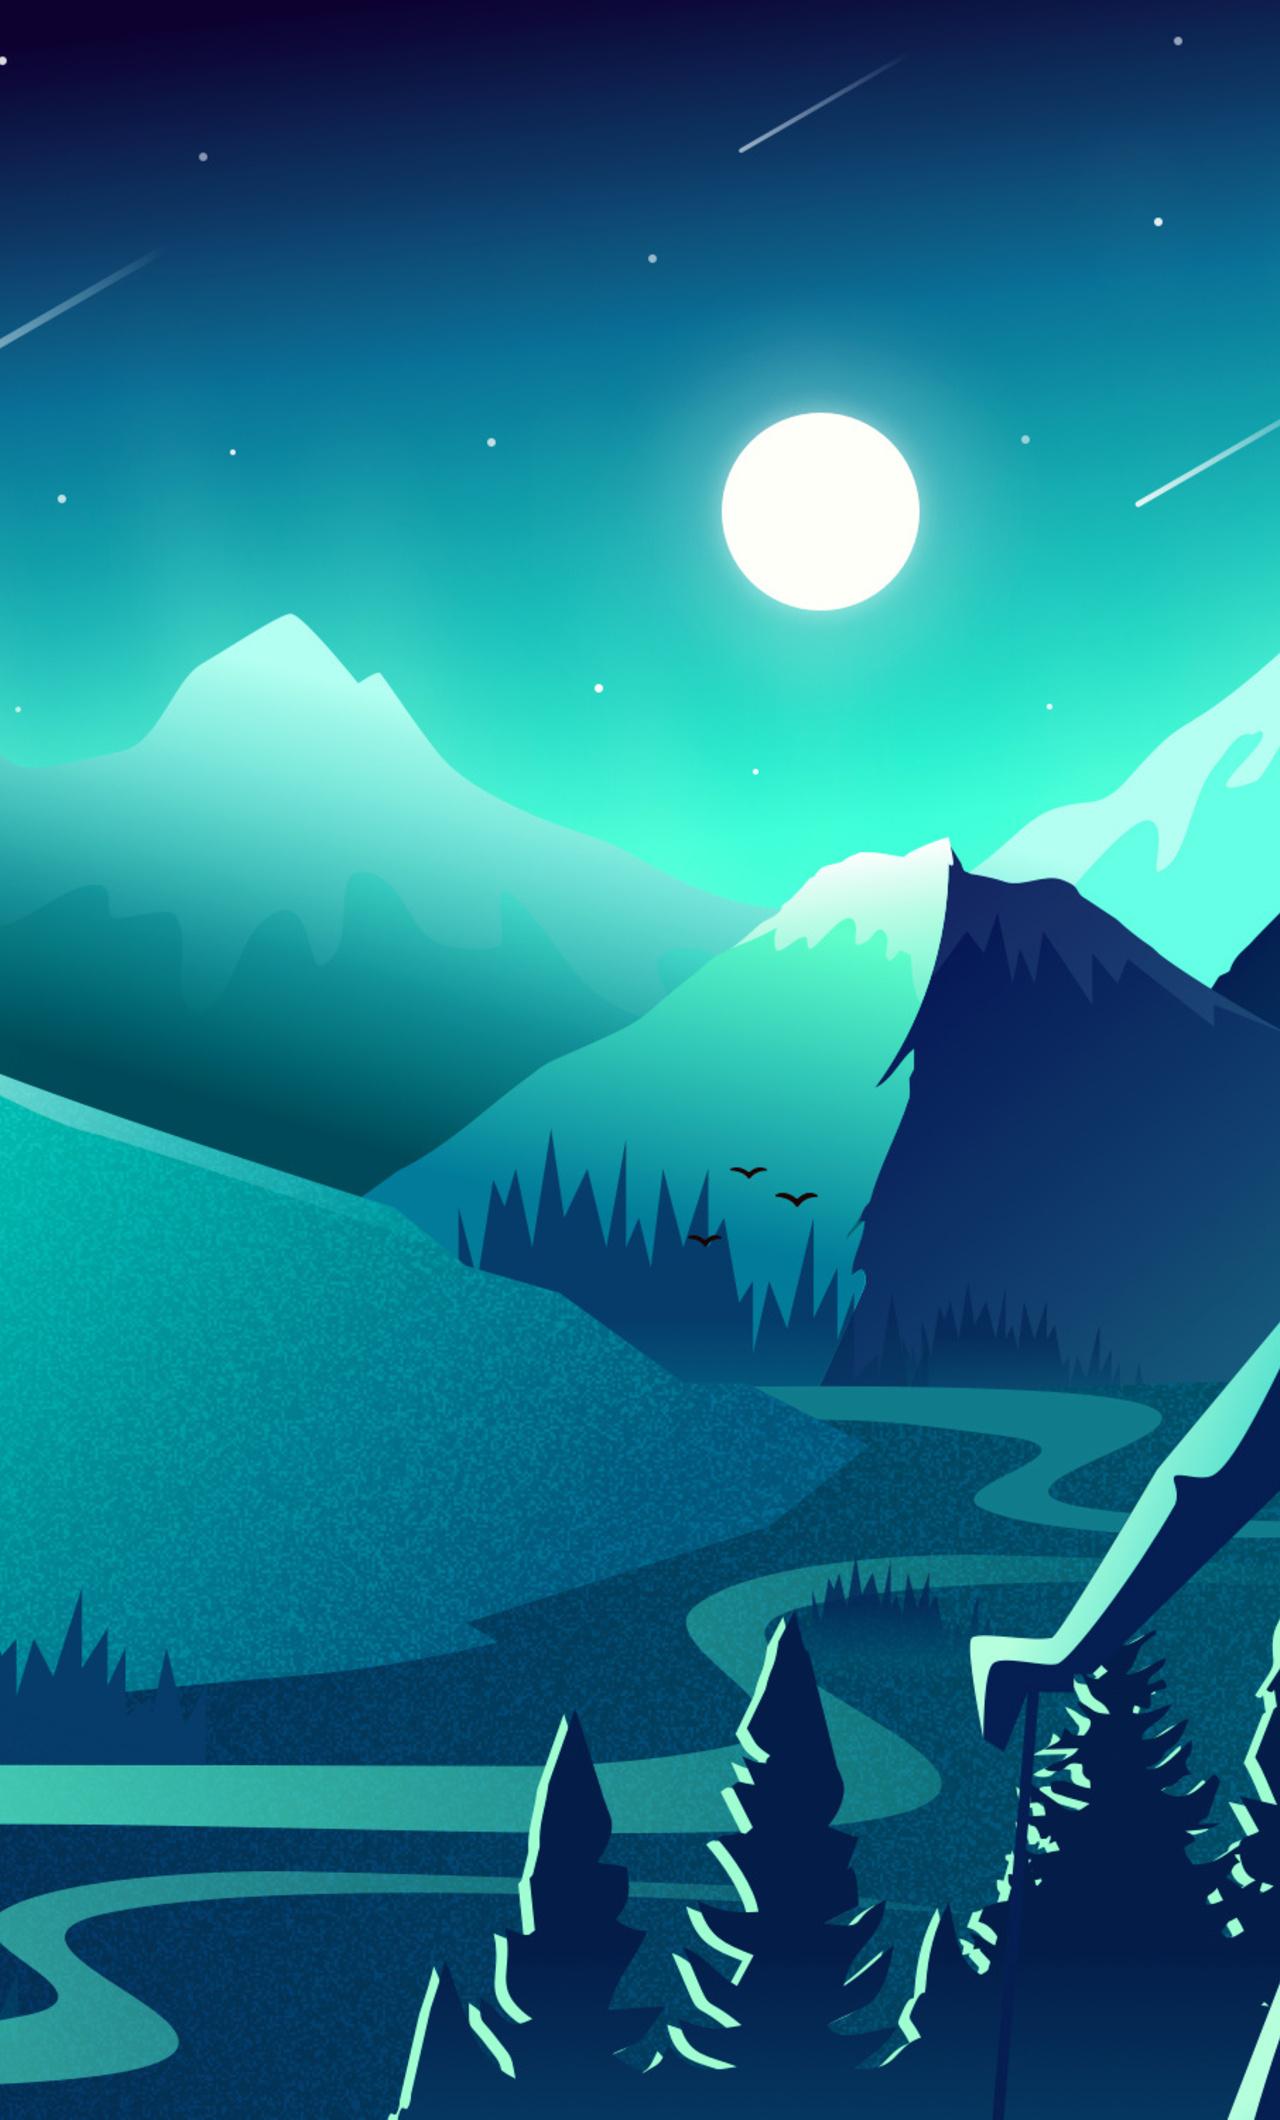 mountain-scenery-minimalism-53.jpg